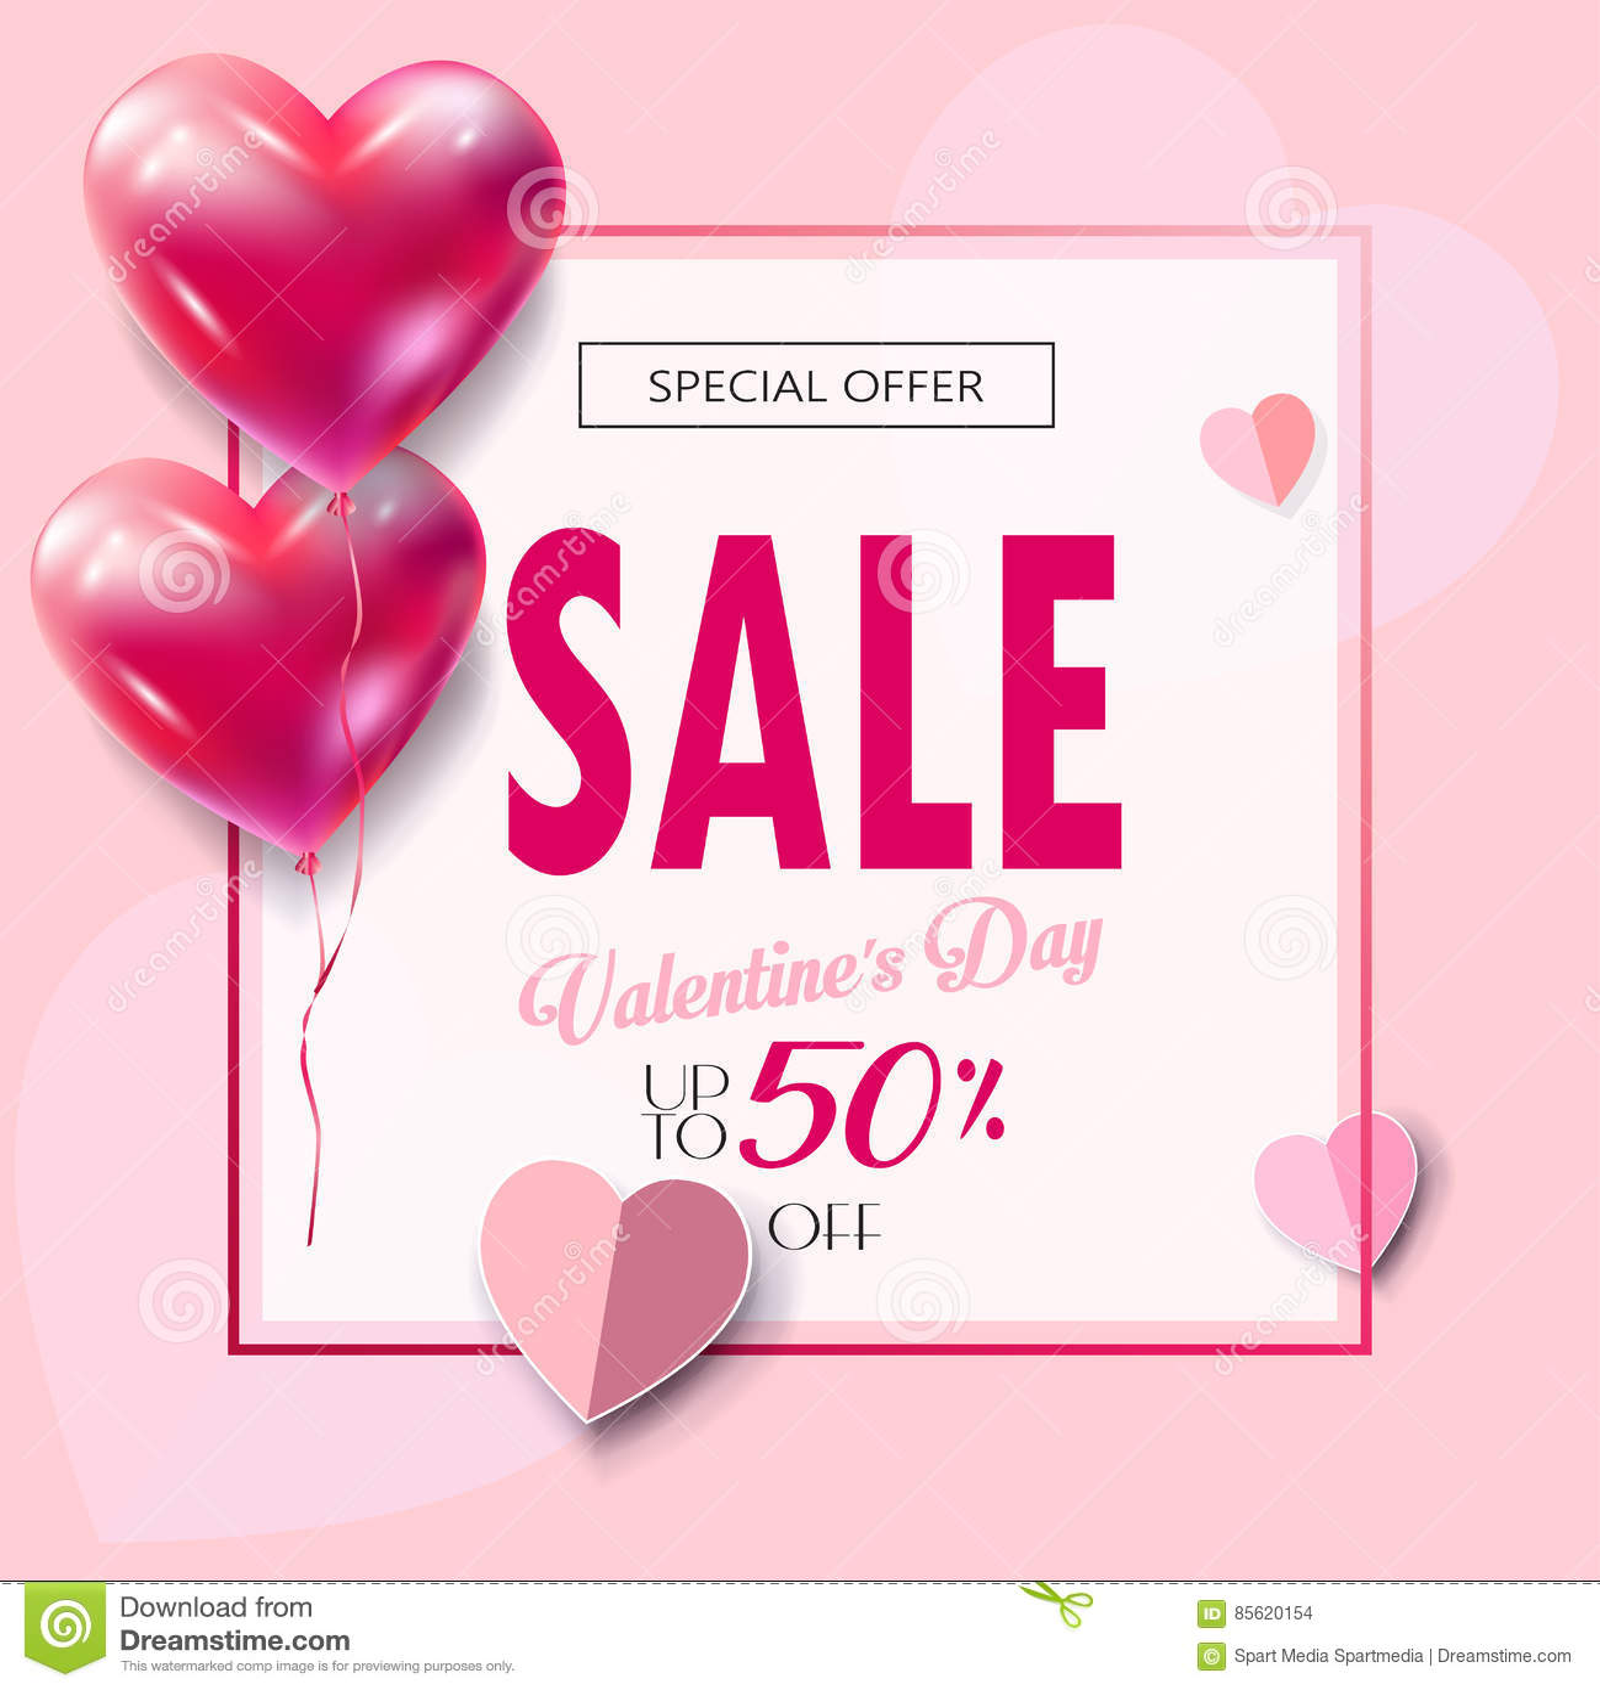 Valentines Day sale banner paper cut